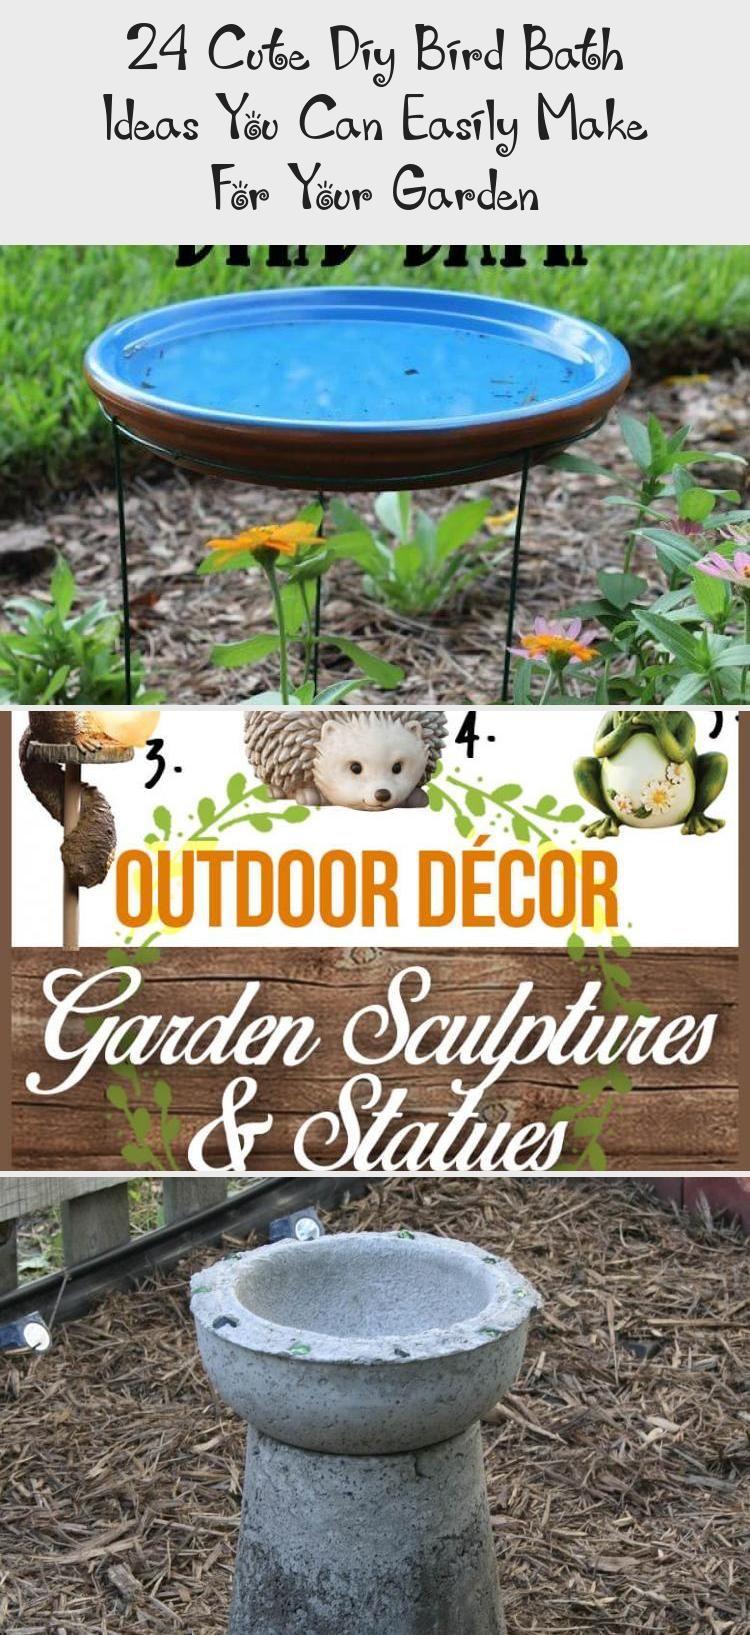 Photo of 24 Cute Diy Bird Bath Ideas You Can Easily Make For Your Garden – Best Diy